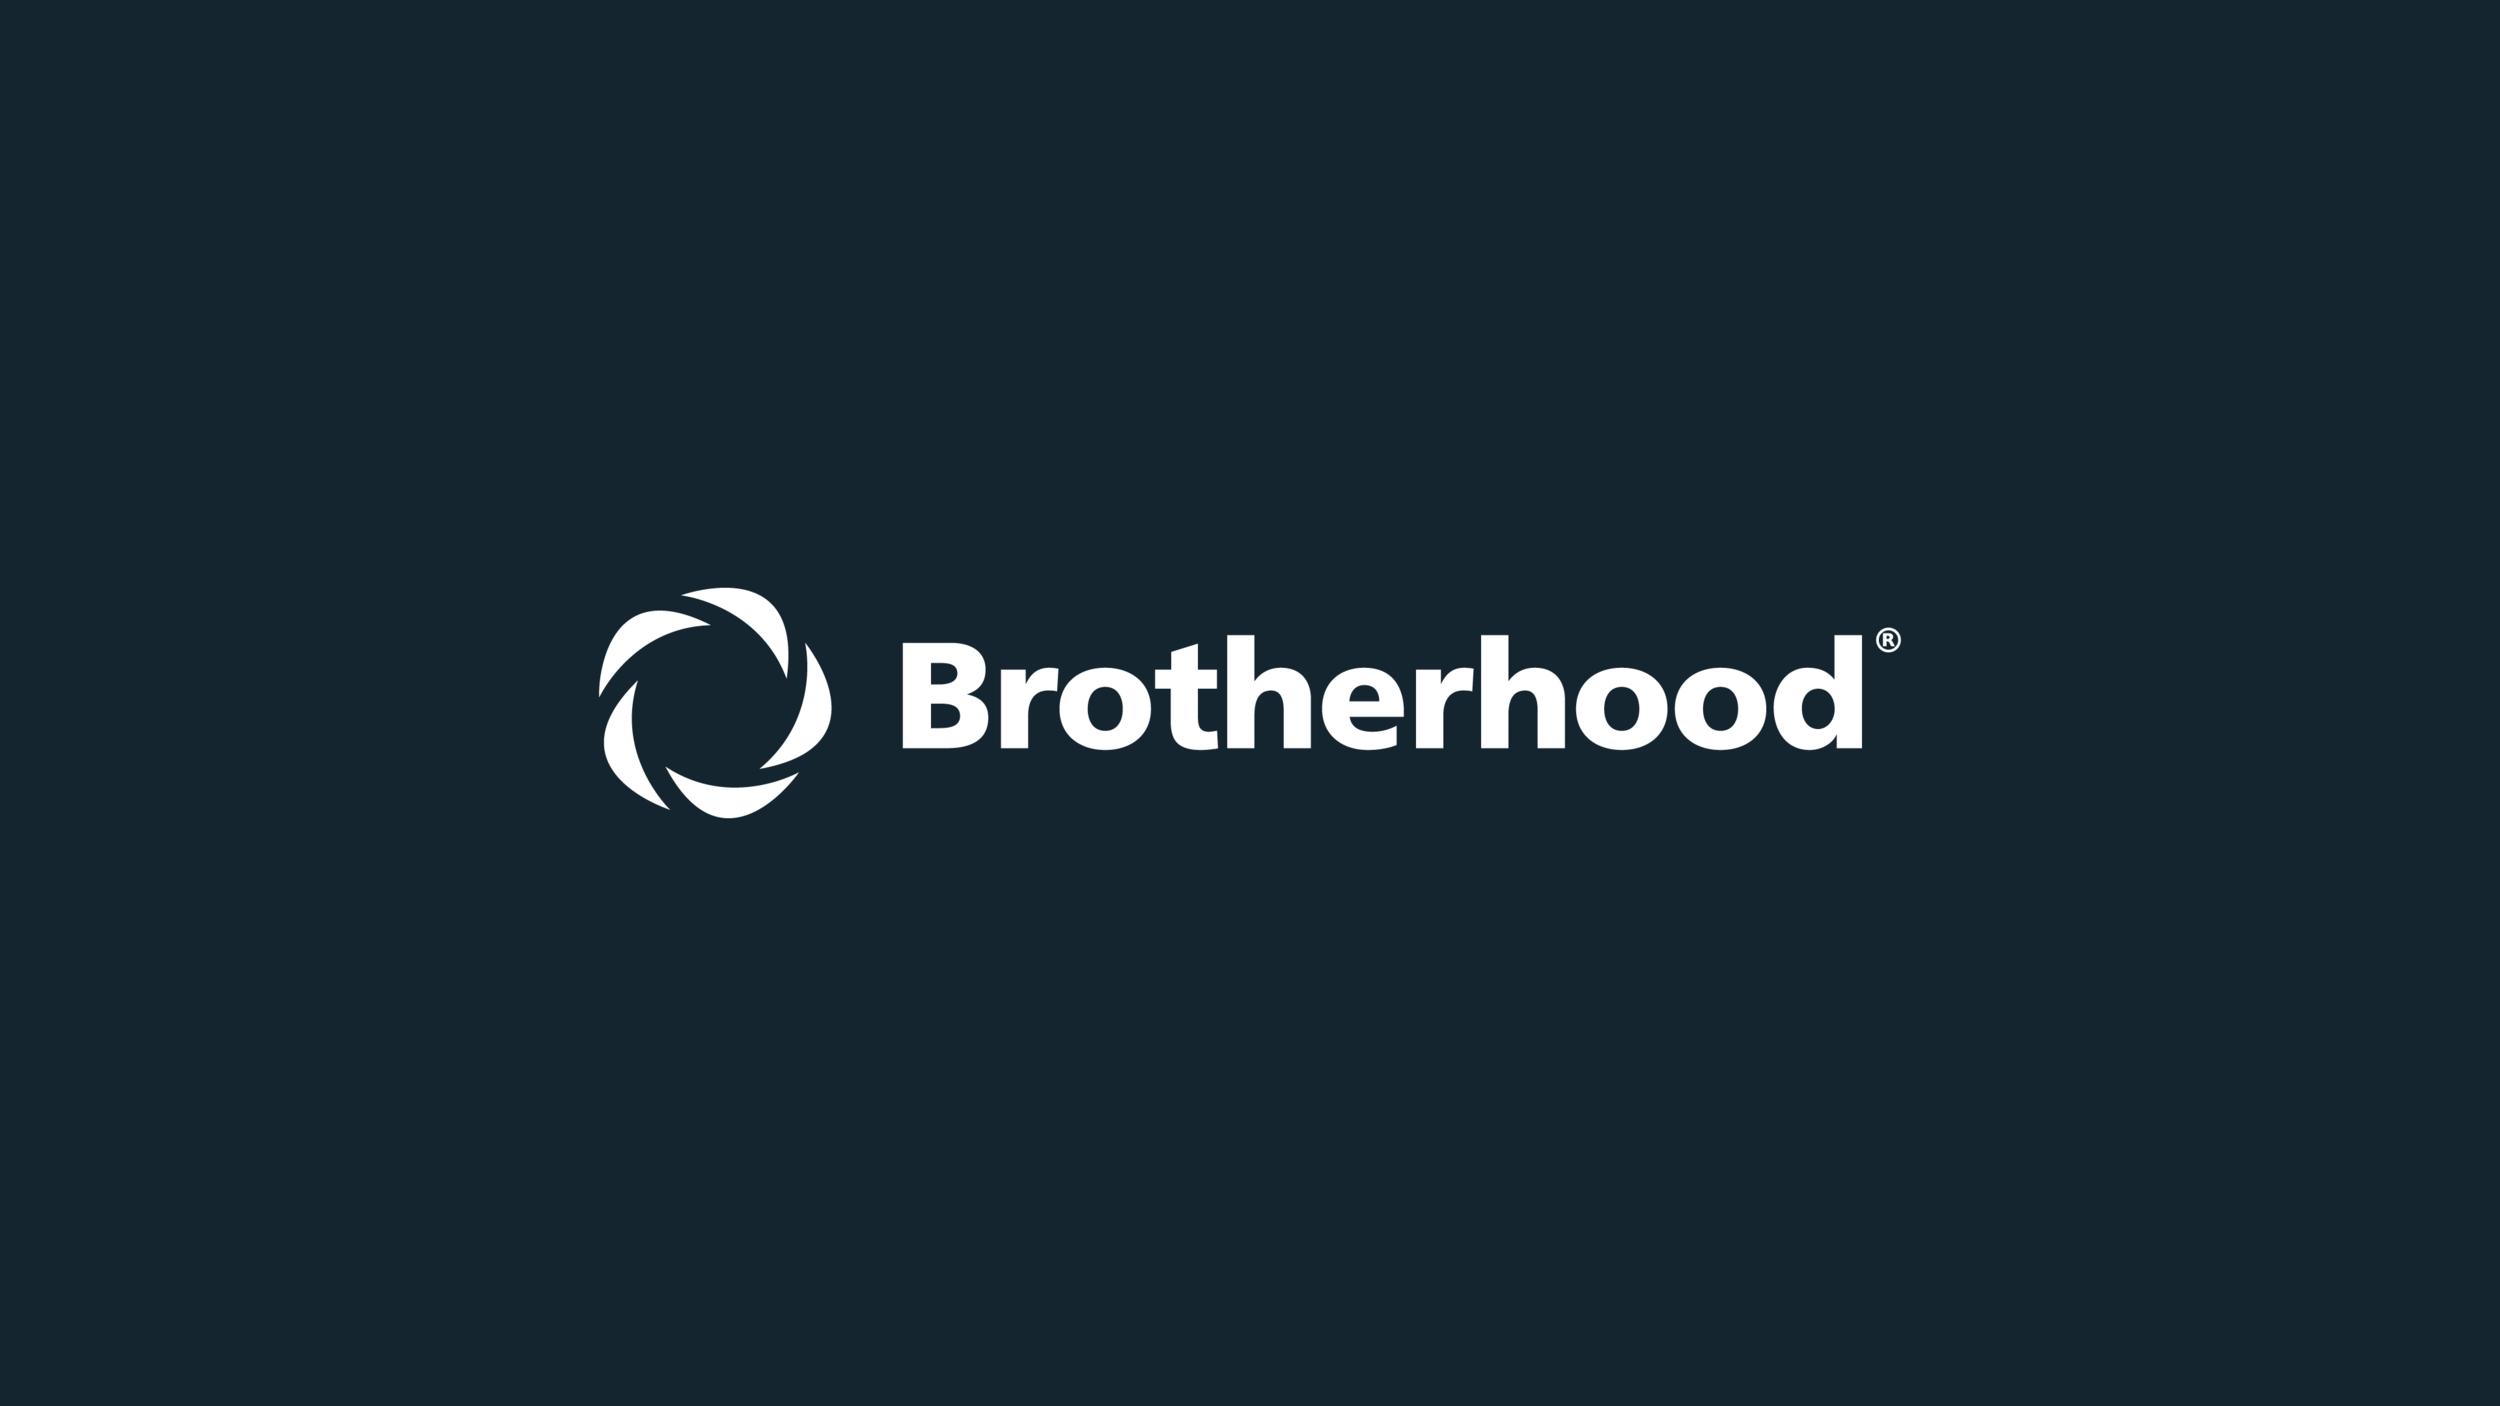 Brotherhood  - Brand Identity